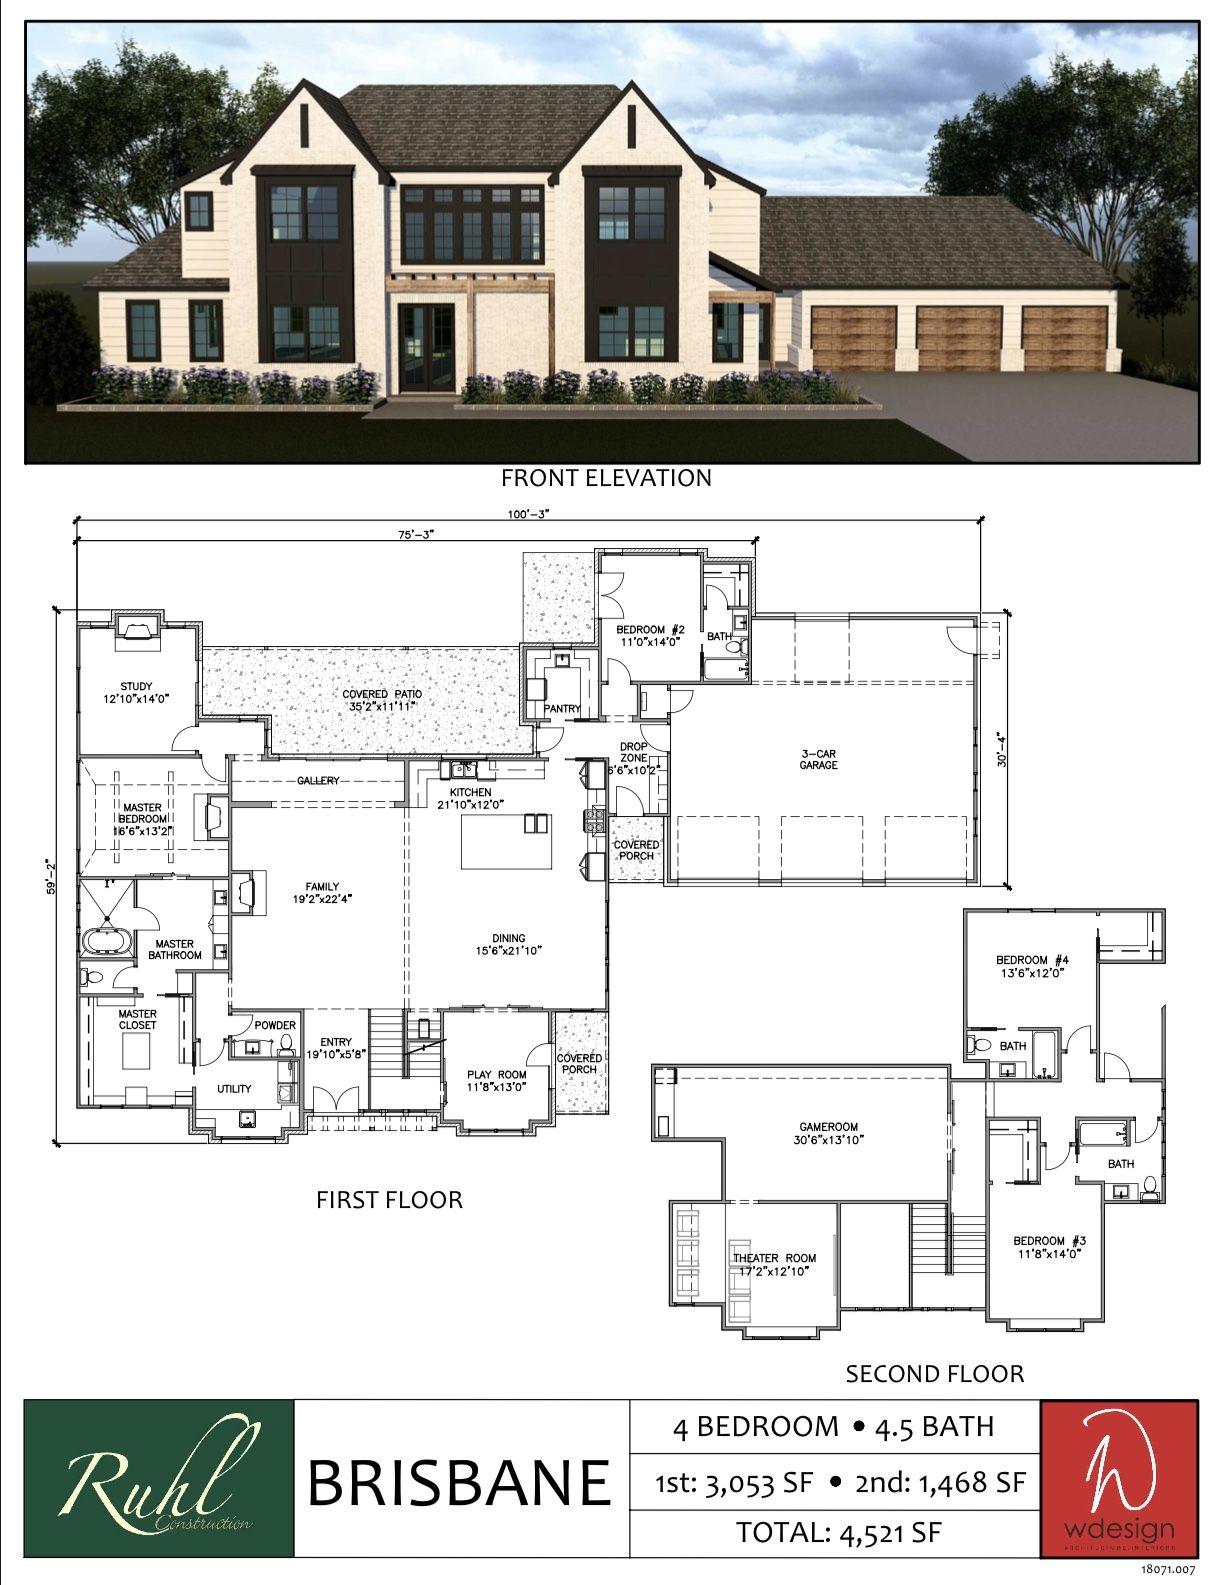 Ruhl Construction Floor Plans Ruhl Constructionruhl Construction Craftsman House Plans Luxury Floor Plans Modern House Floor Plans